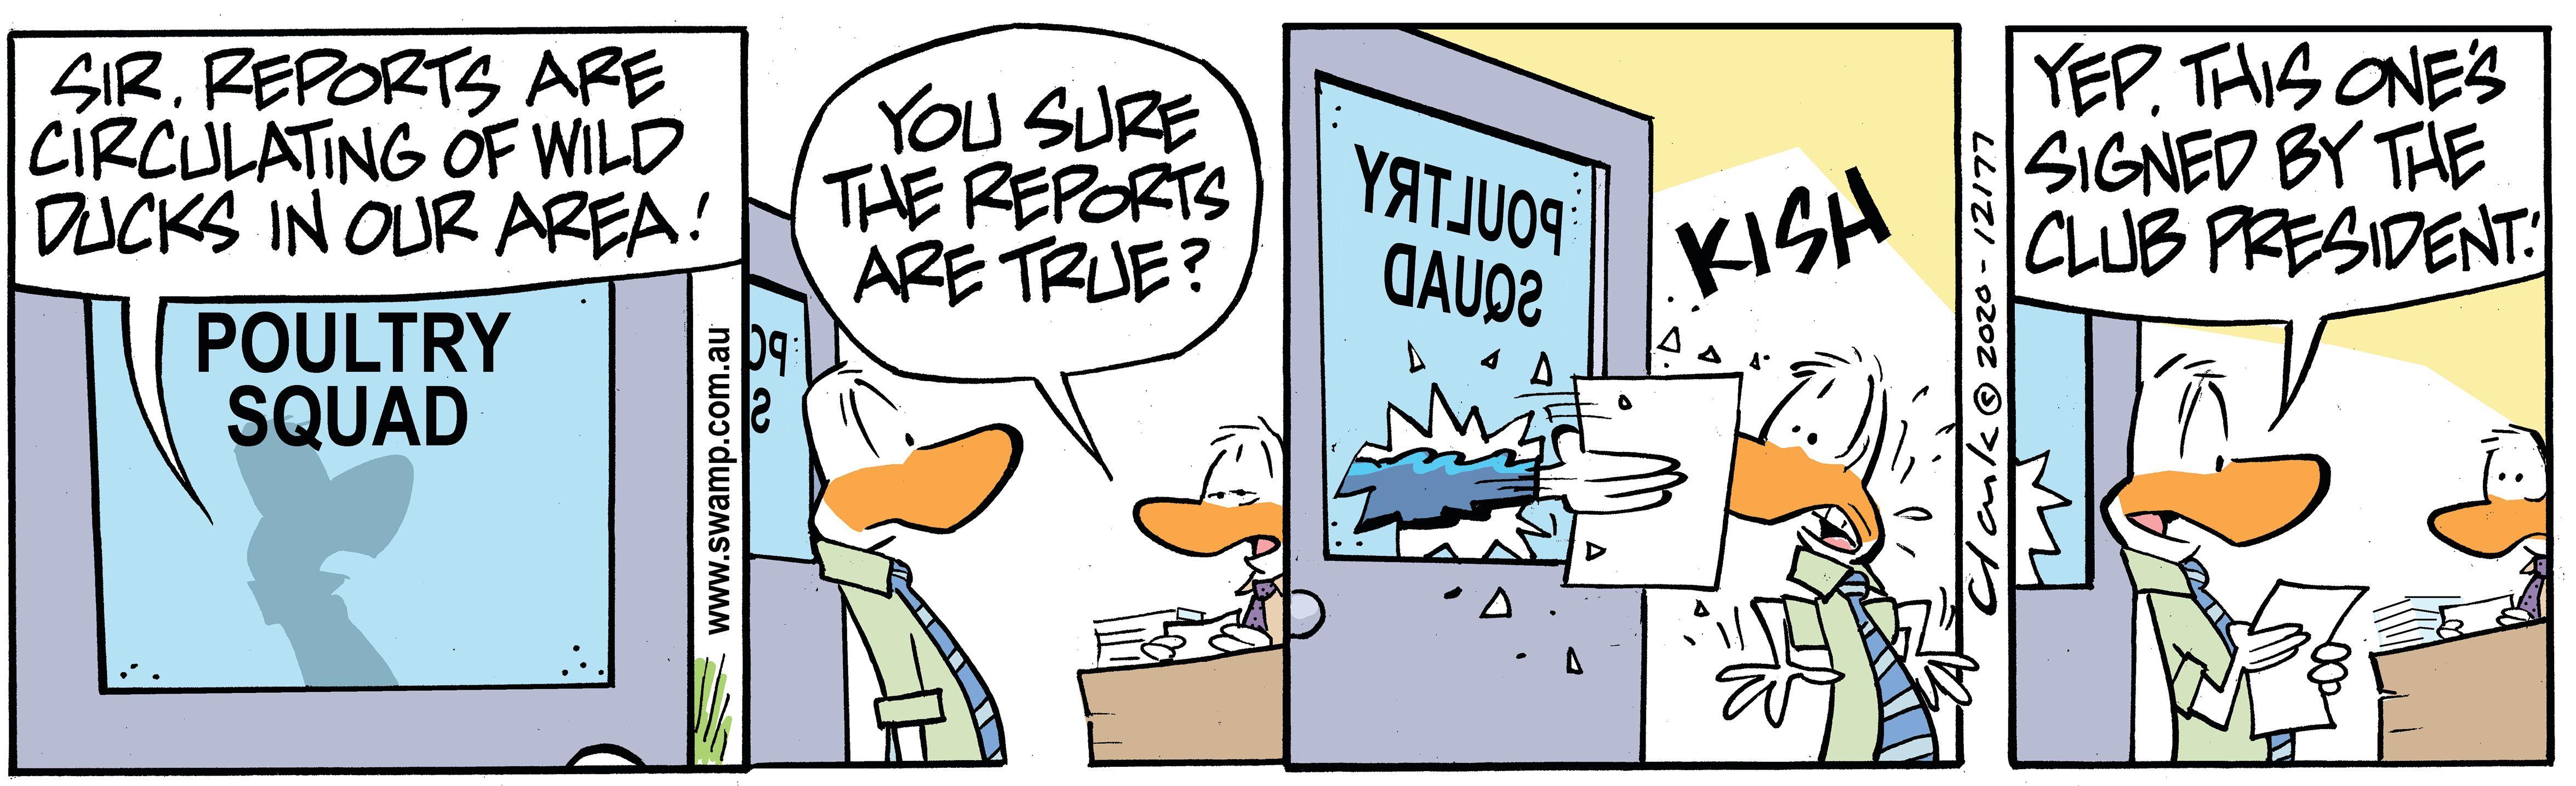 Reports of Wild Ducks